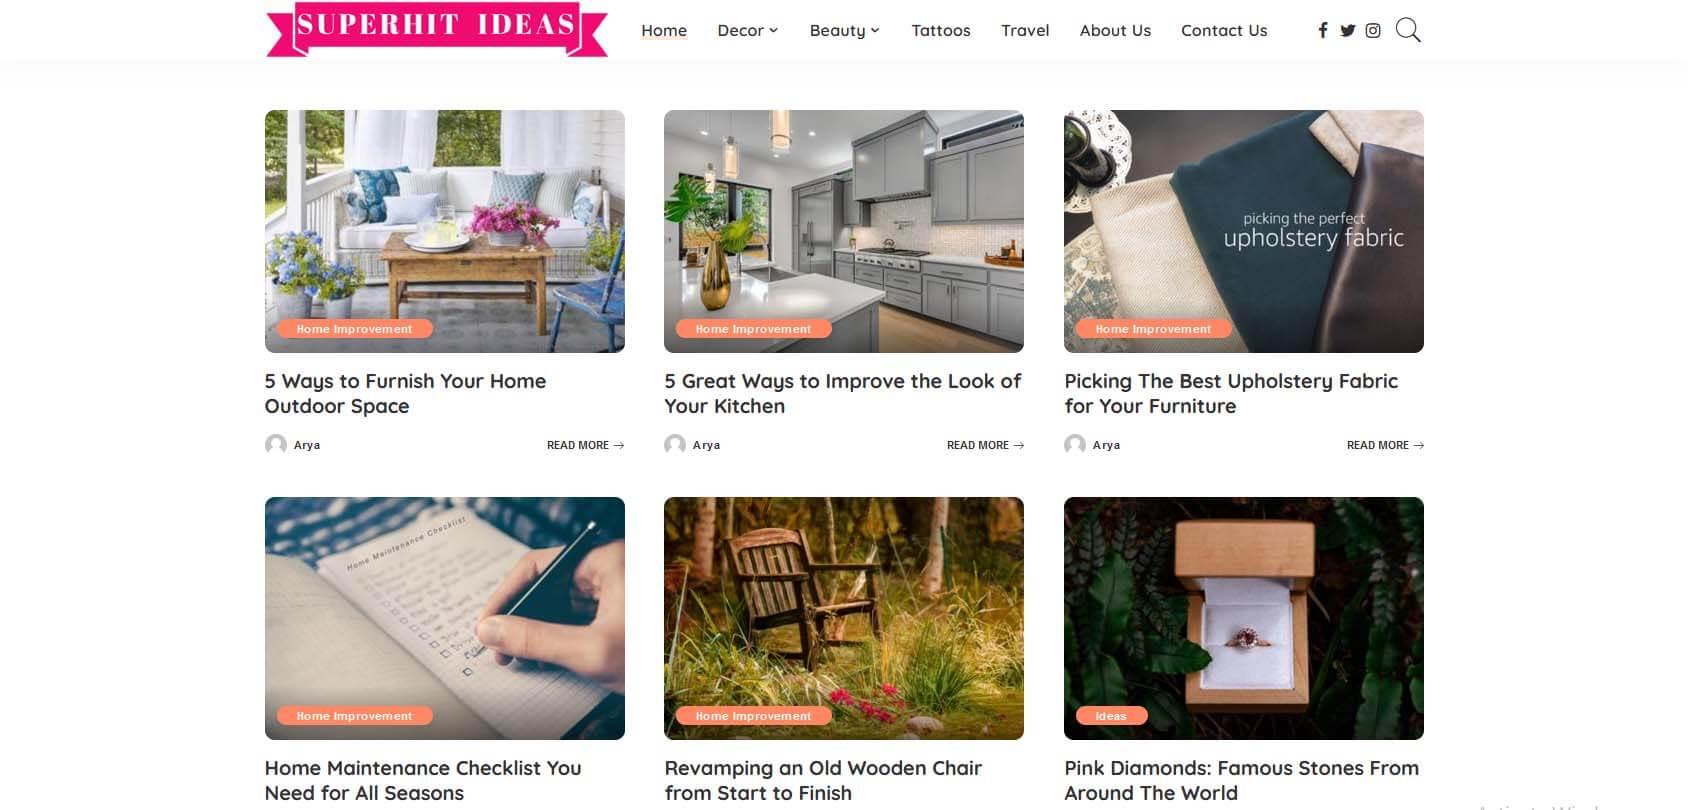 Superhit Ideas Homepage